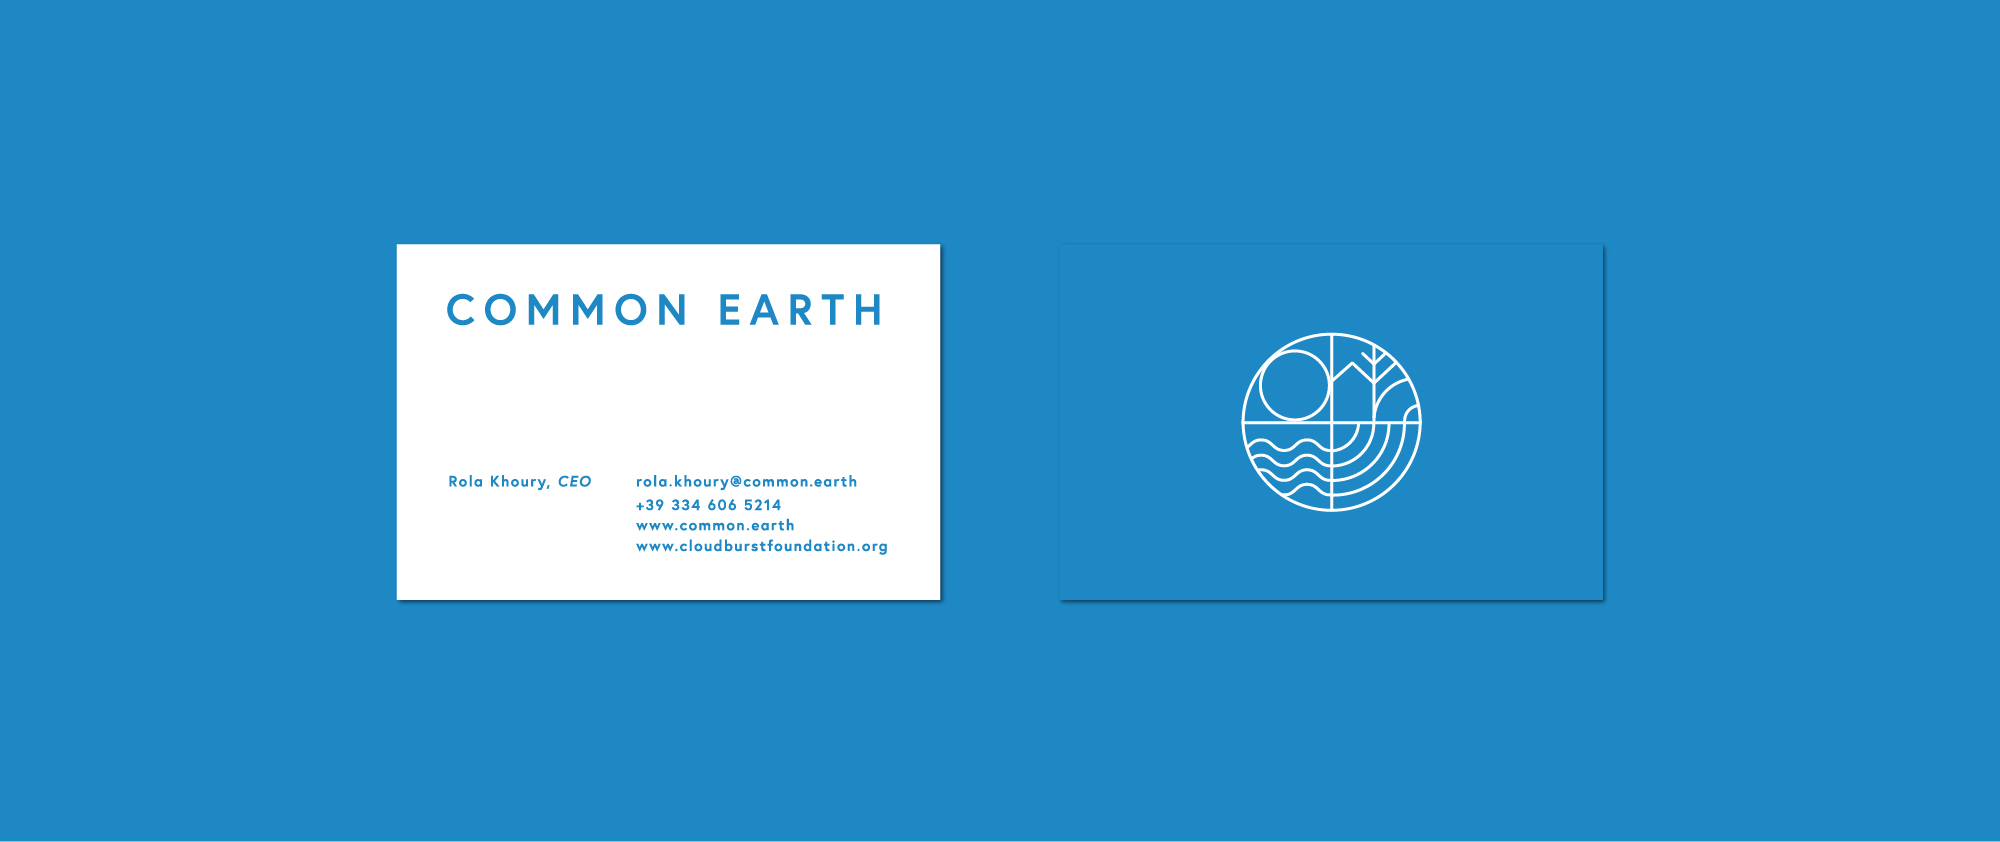 viscayawagner_select_common-earth_-03.jpg